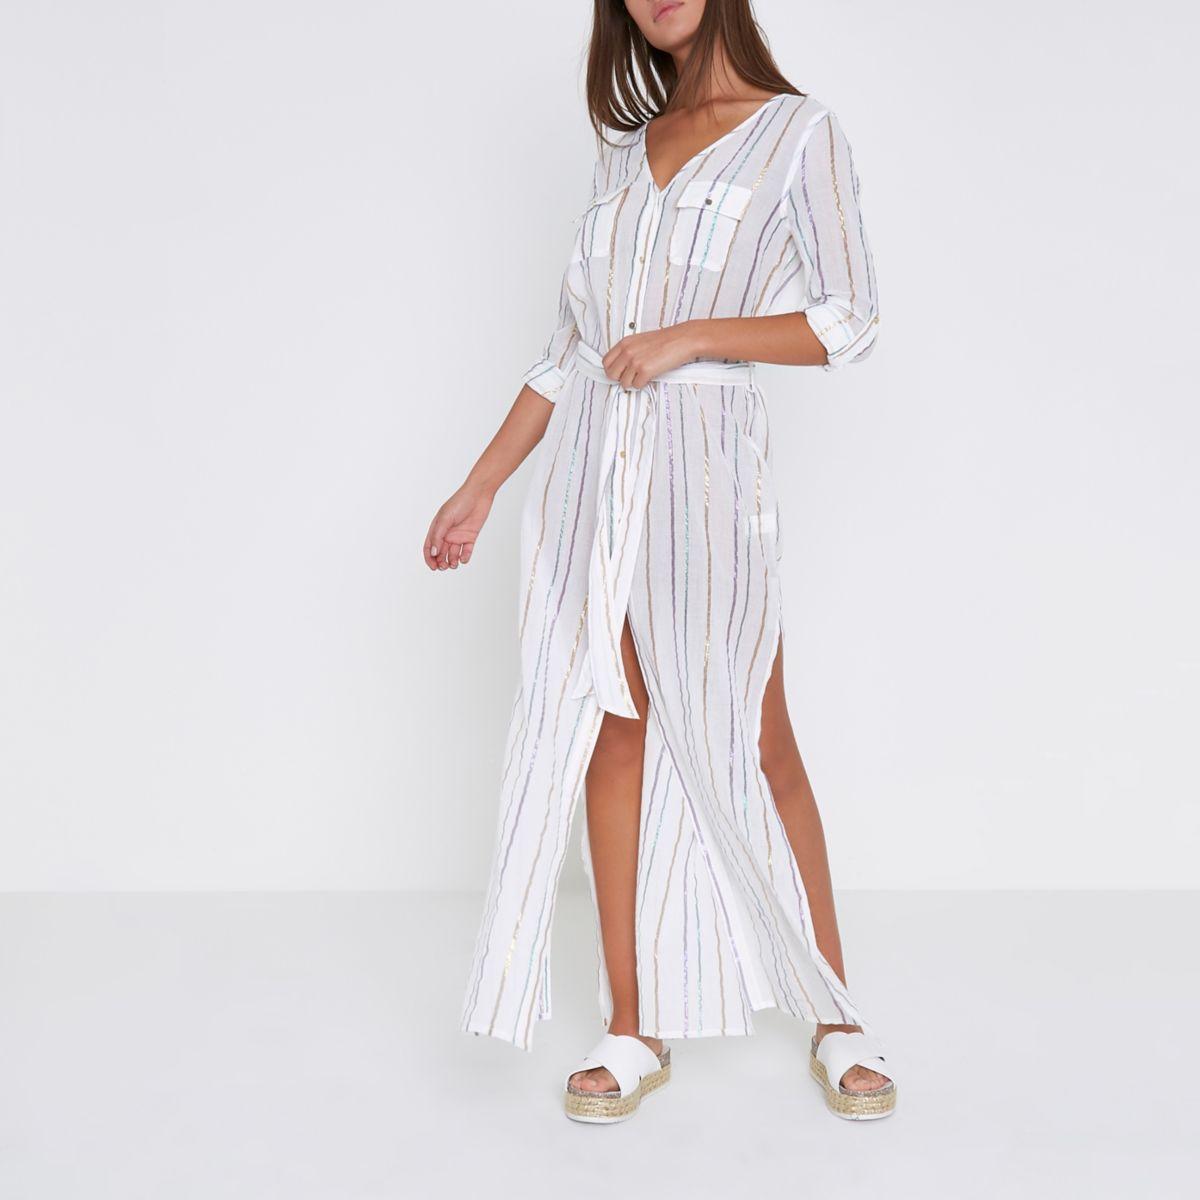 White stripe maxi shirt beach cover up kaftans cover for Beach shirt cover up